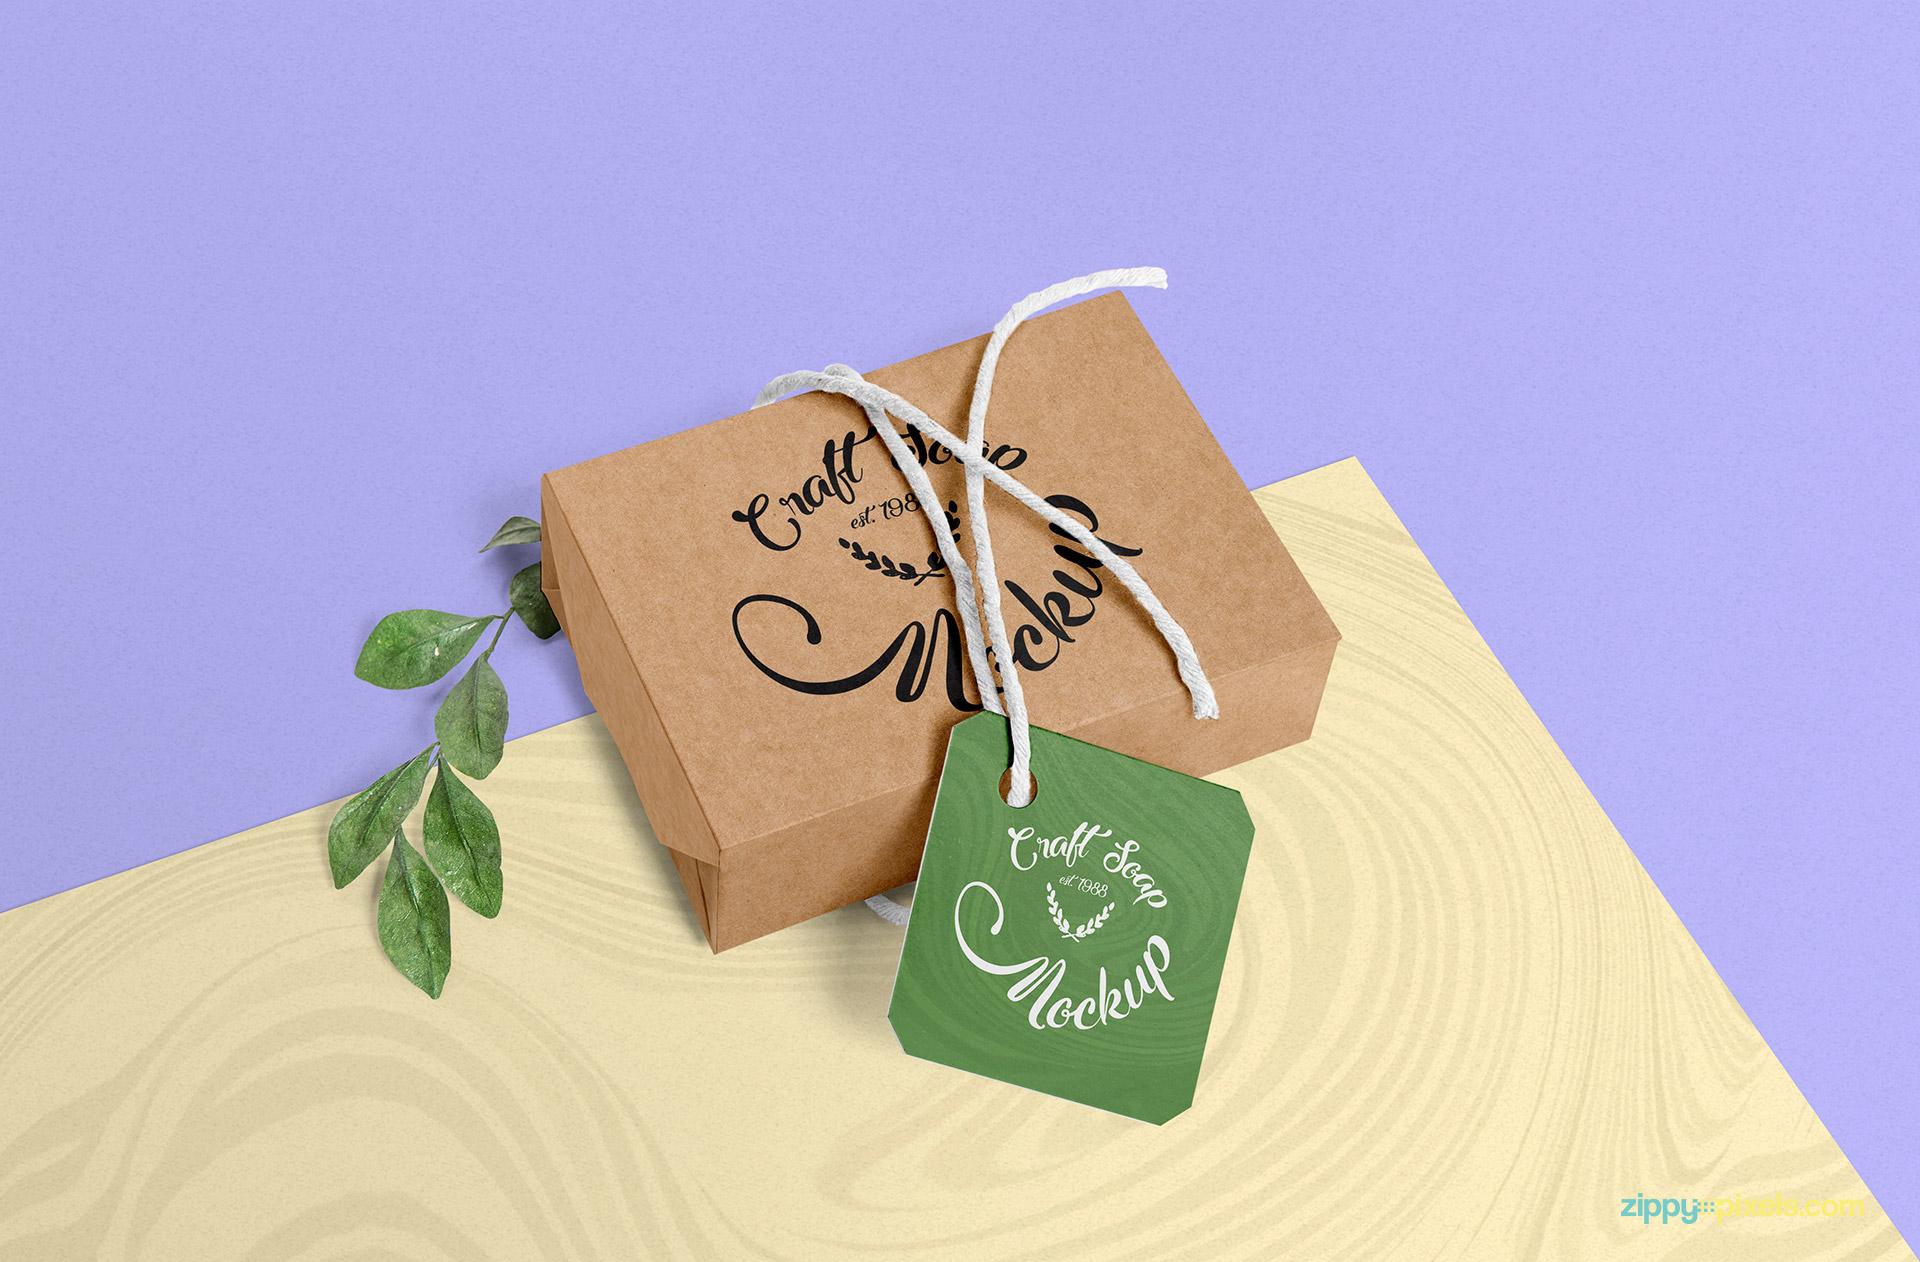 Free craft soap box mockup.